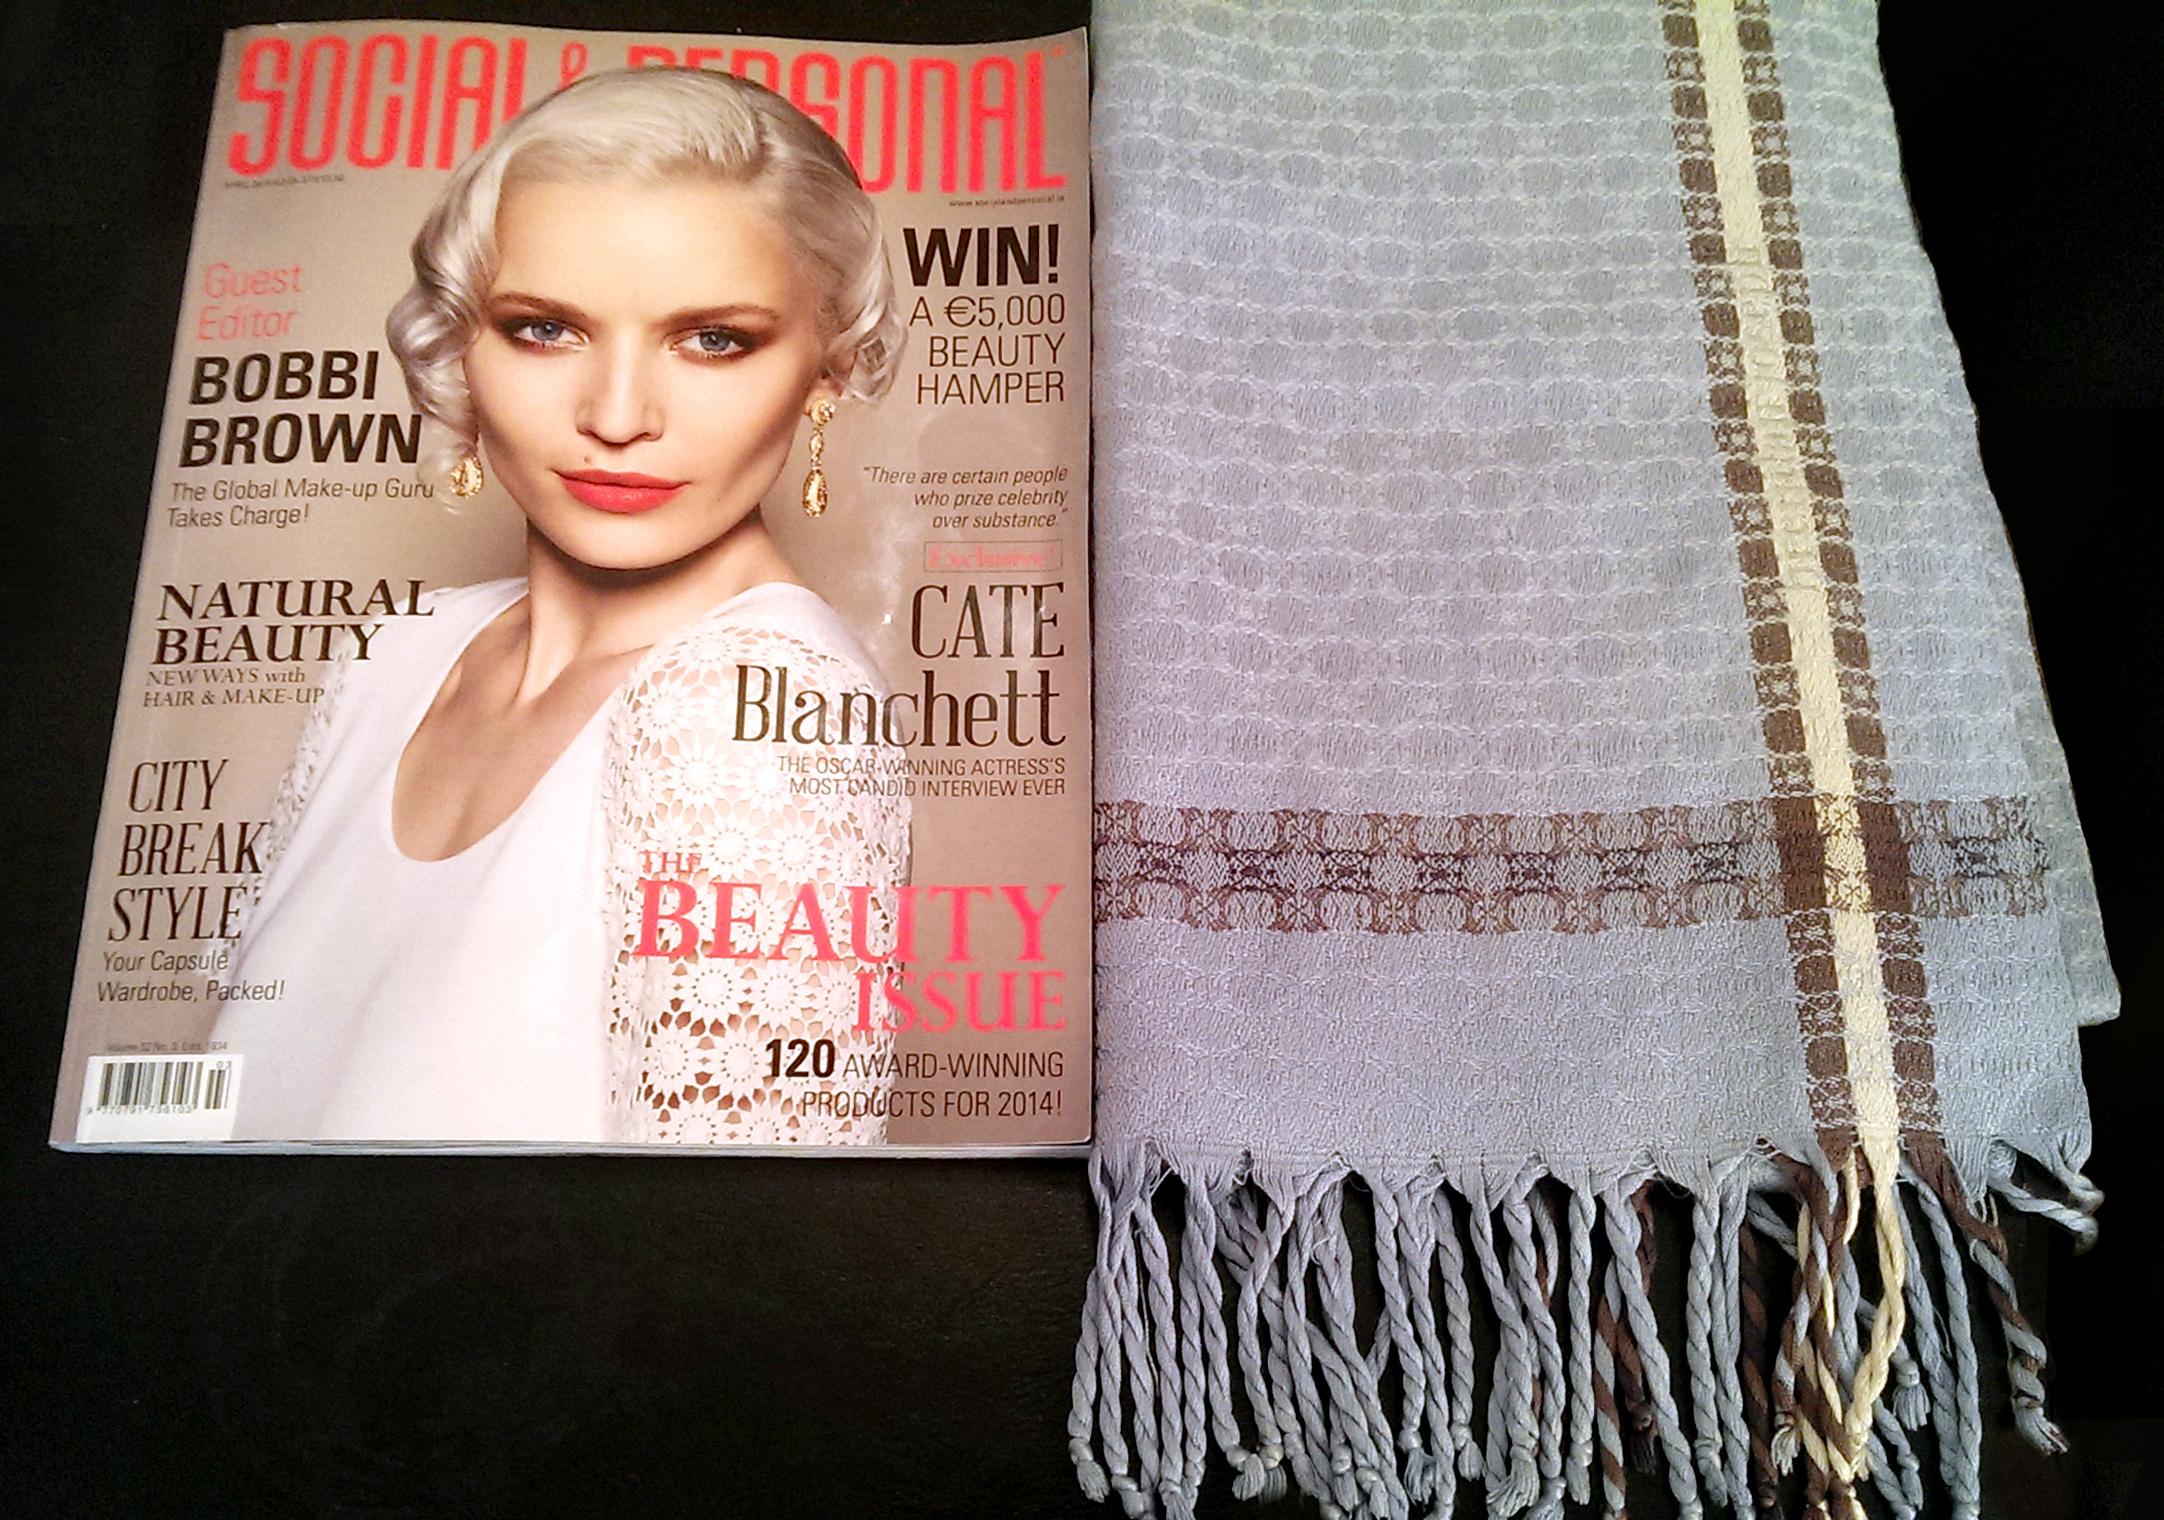 social-and-personal-magazine-april-2014-bobbi-brown-cate-blanchett-brendan-joseph-ireland